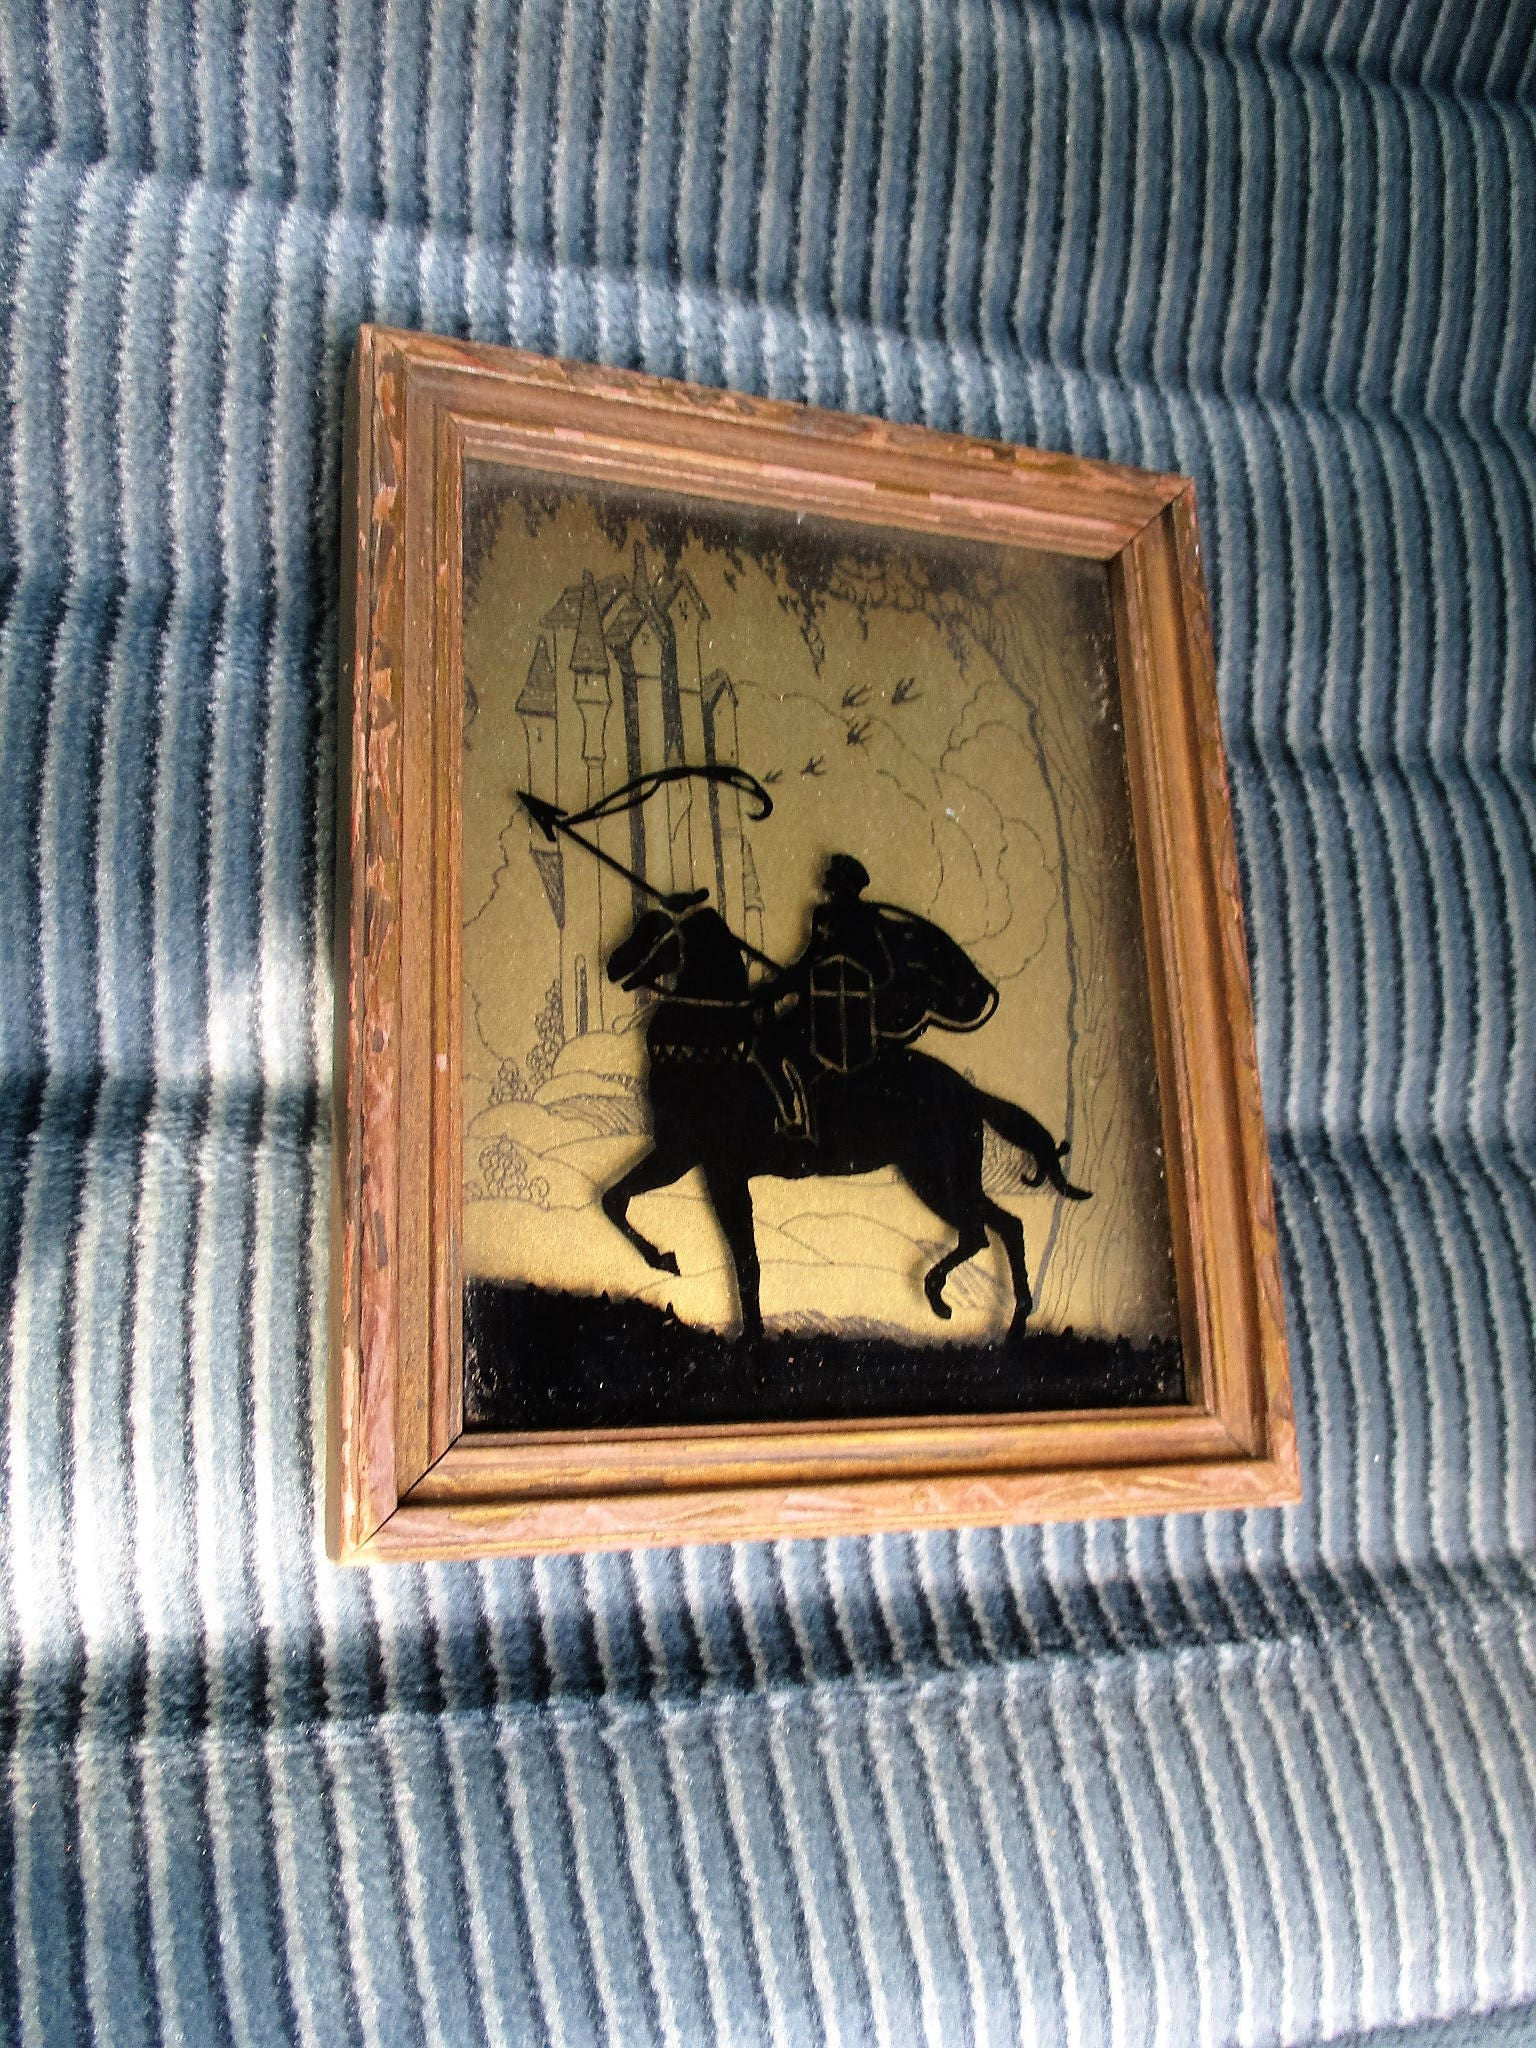 Arte de VTG Reverso de Deco vidrio pintado enmarcado caballero en ...